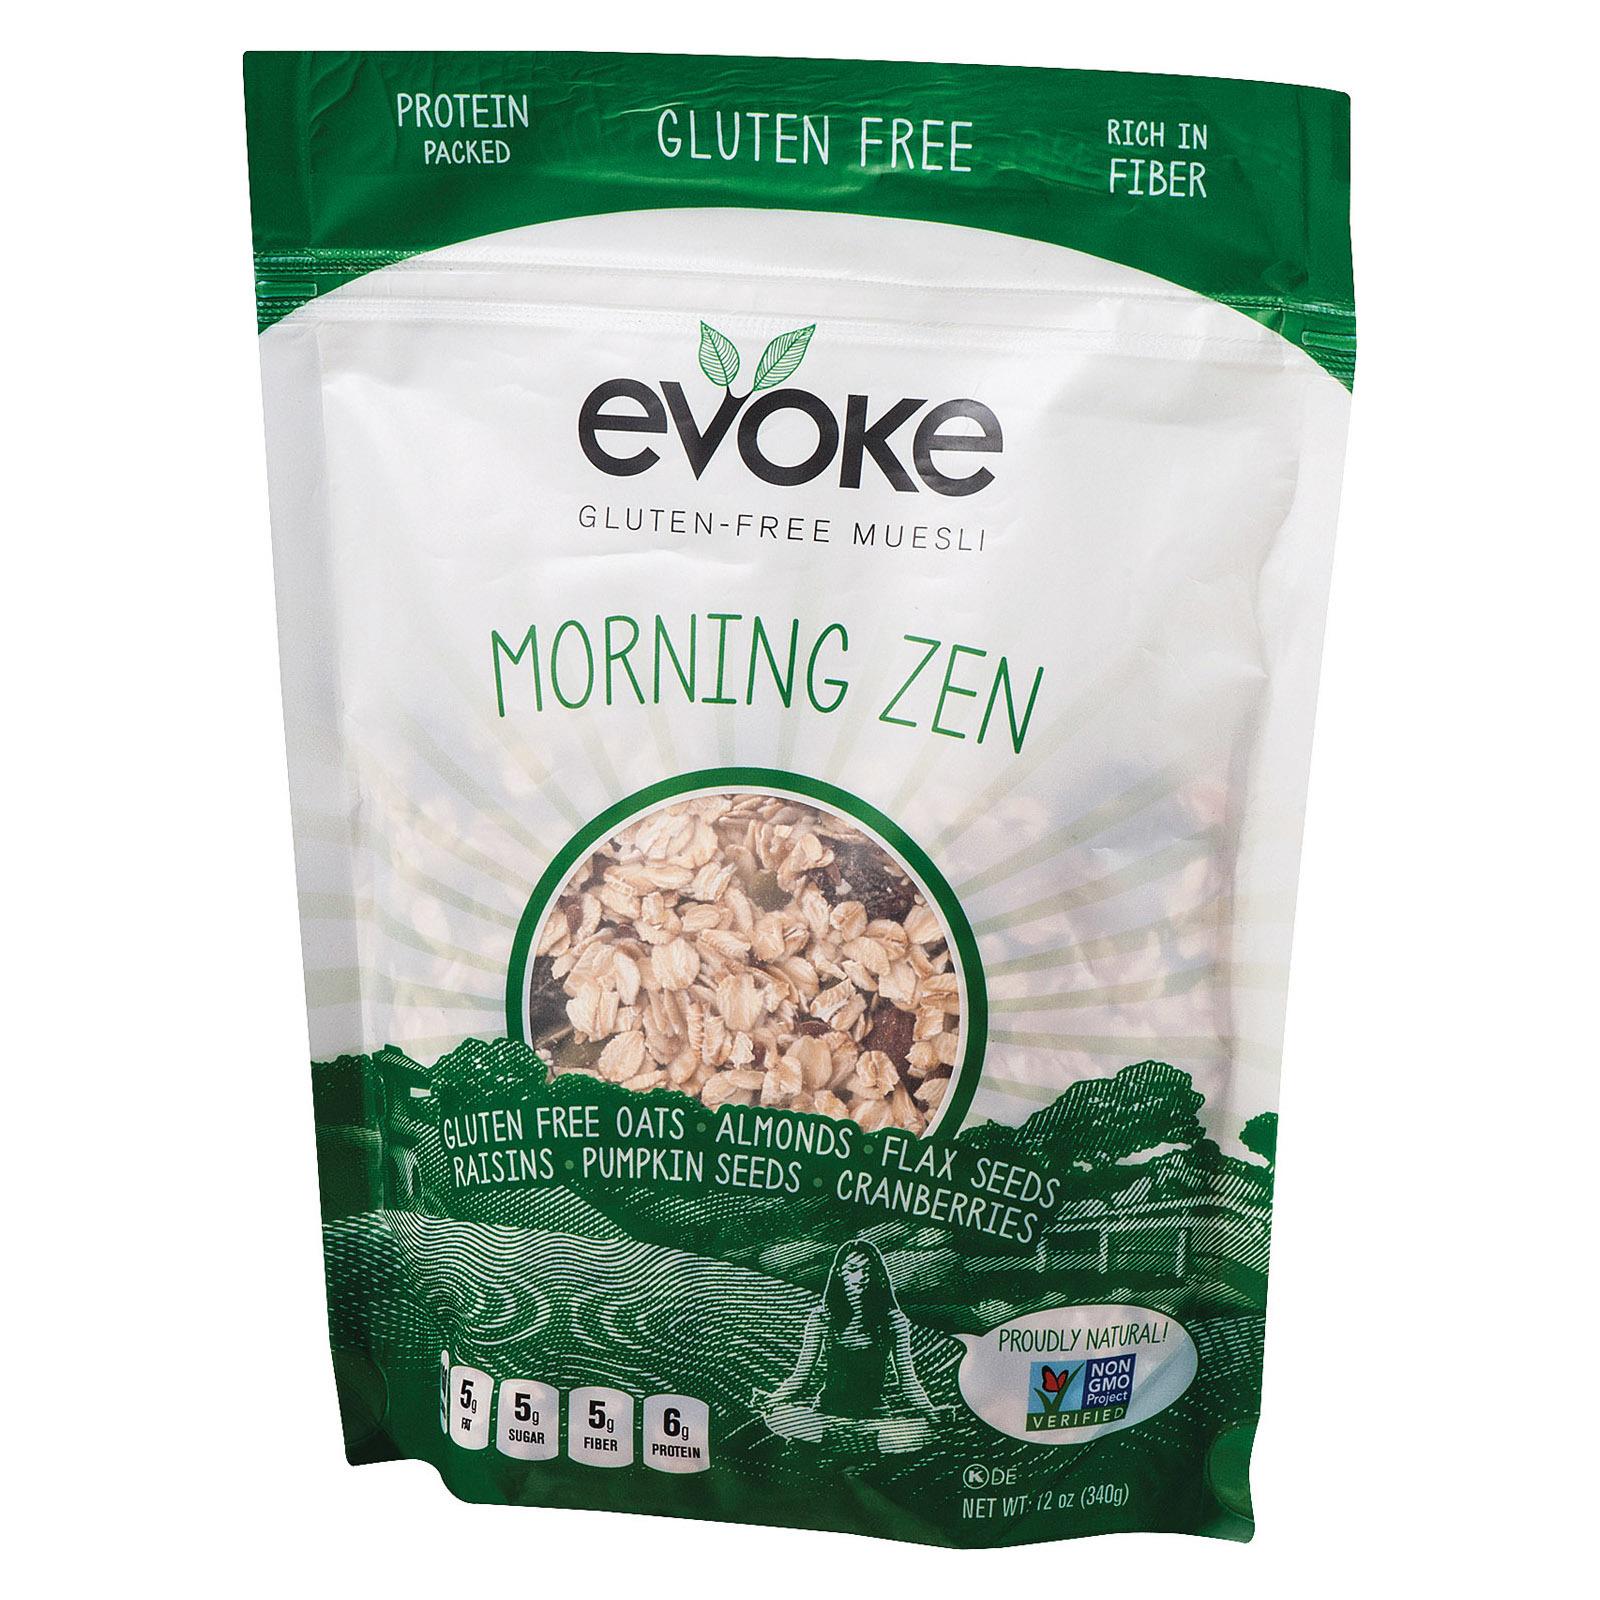 Evoke Healthy Foods Zen Gluten Free Muesli - Free Muesli - Case of 6 - 12 oz.